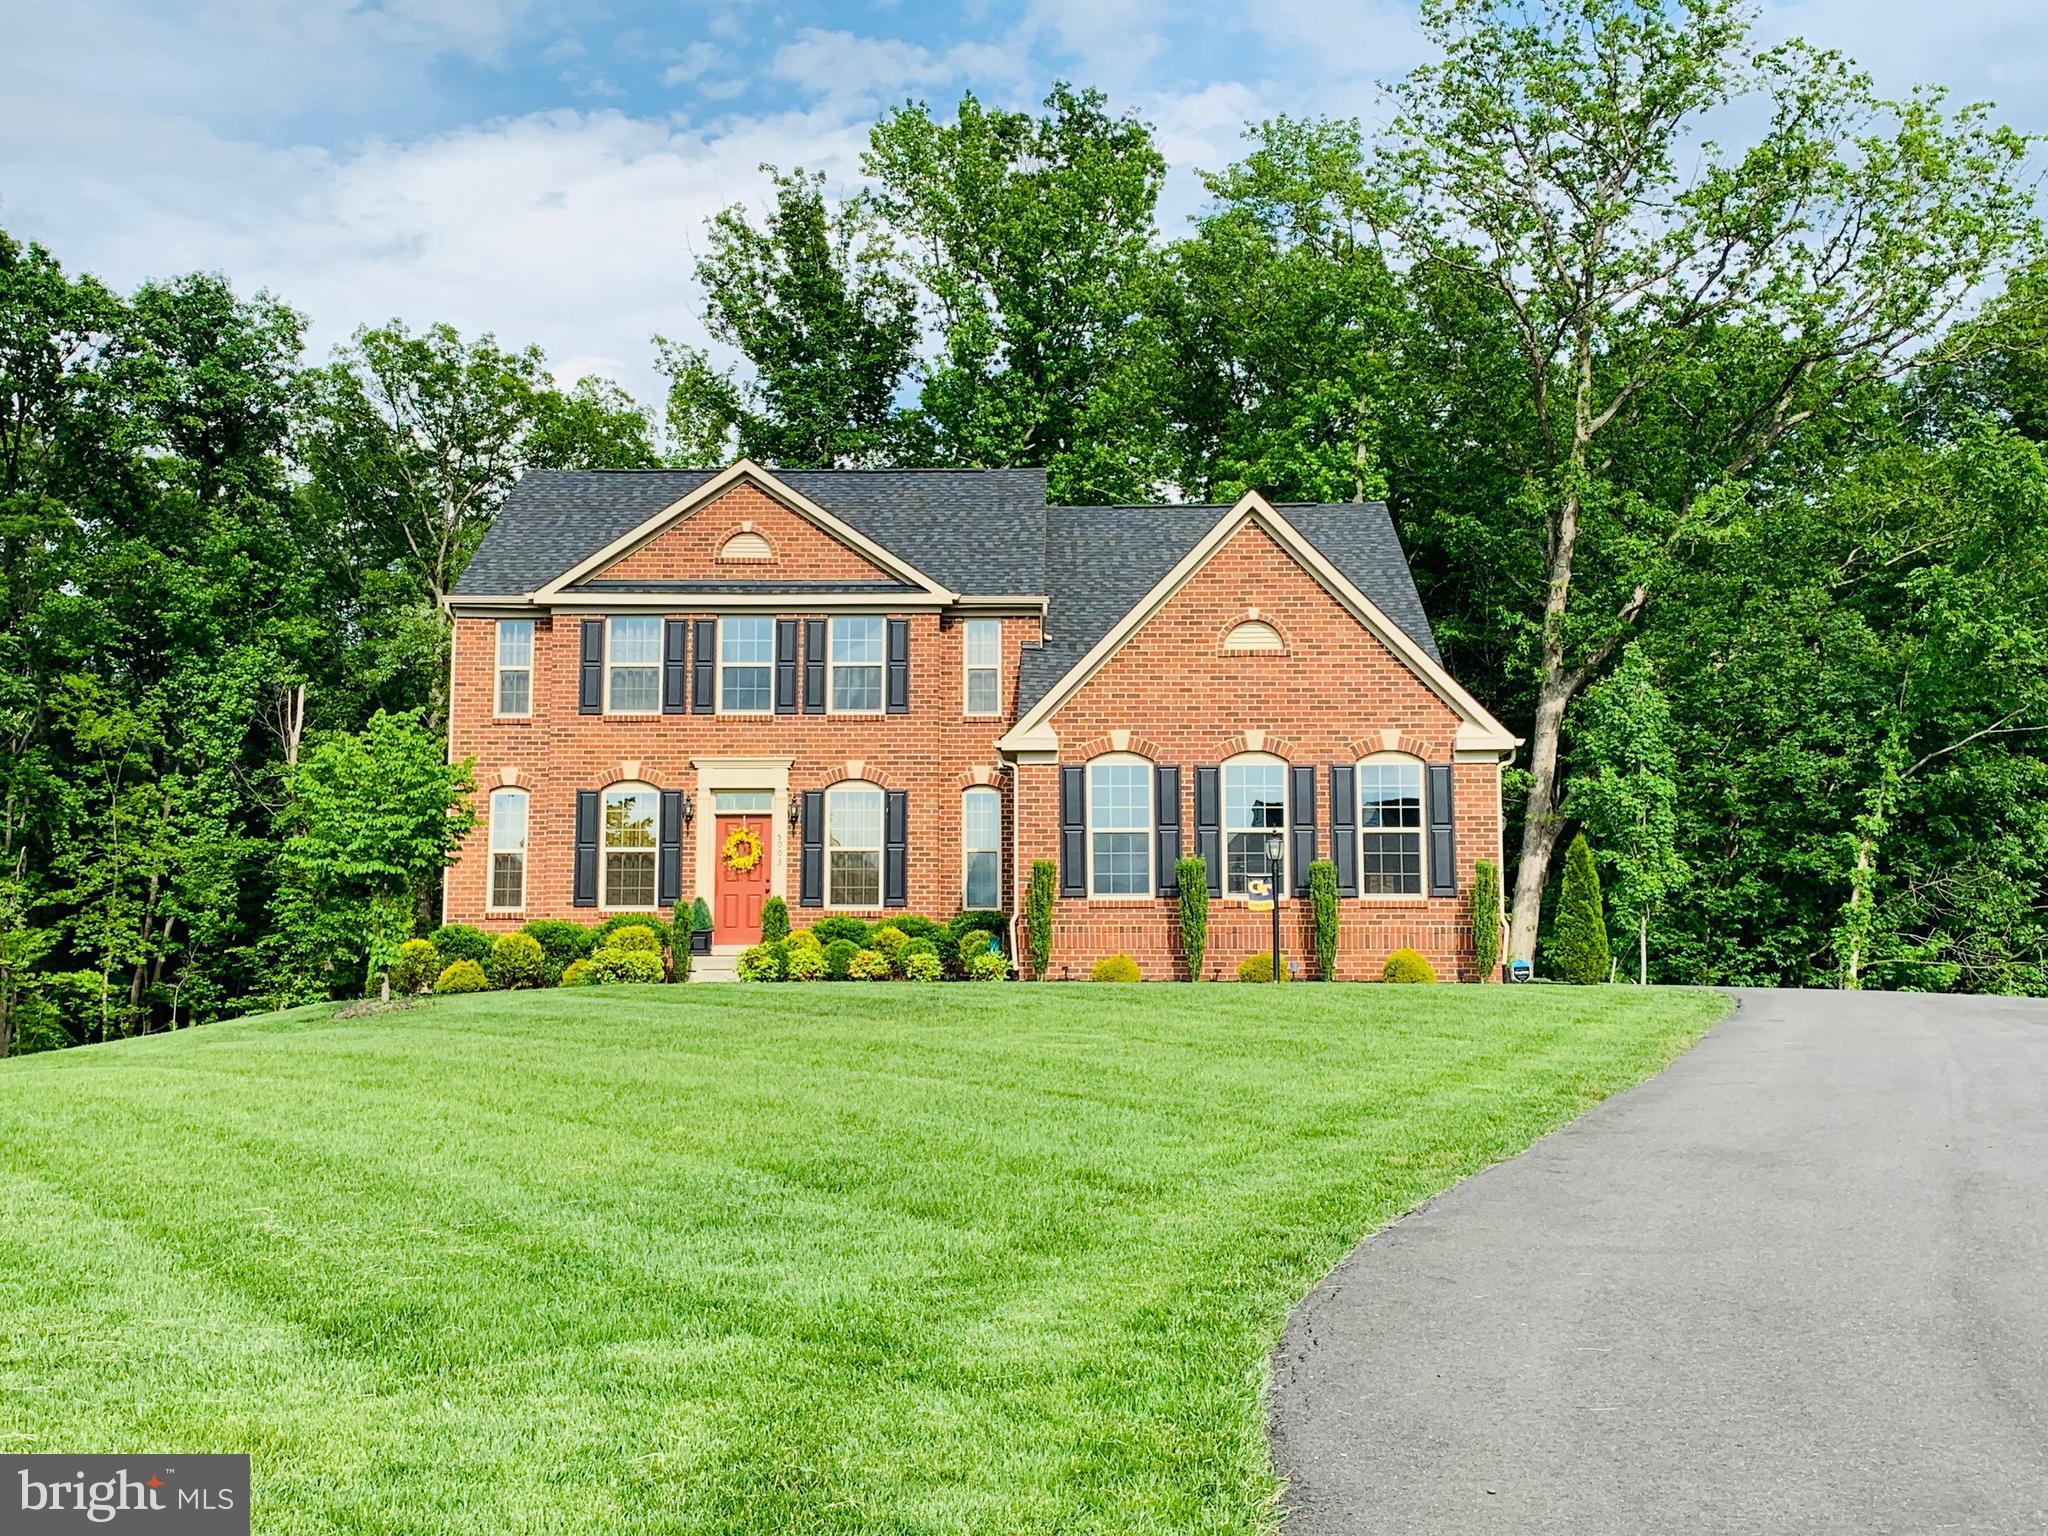 All DC Side of Warrenton VA Homes for Sale on DC Side of Warrenton